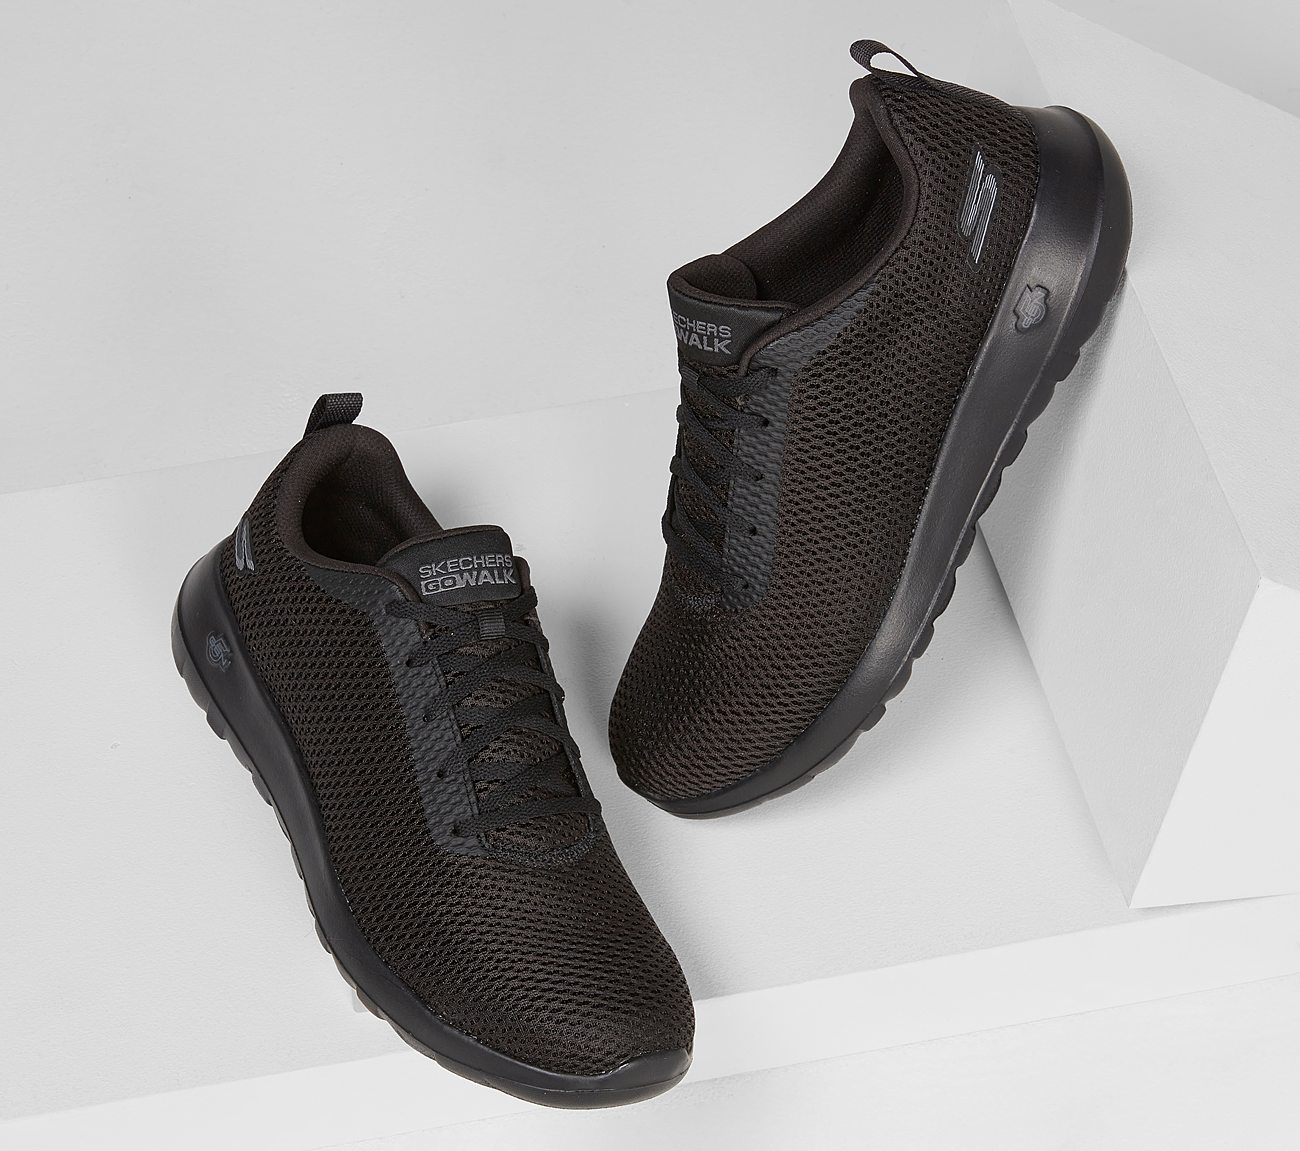 Skechers Mens GOwalk Max Effort Walking Shoes